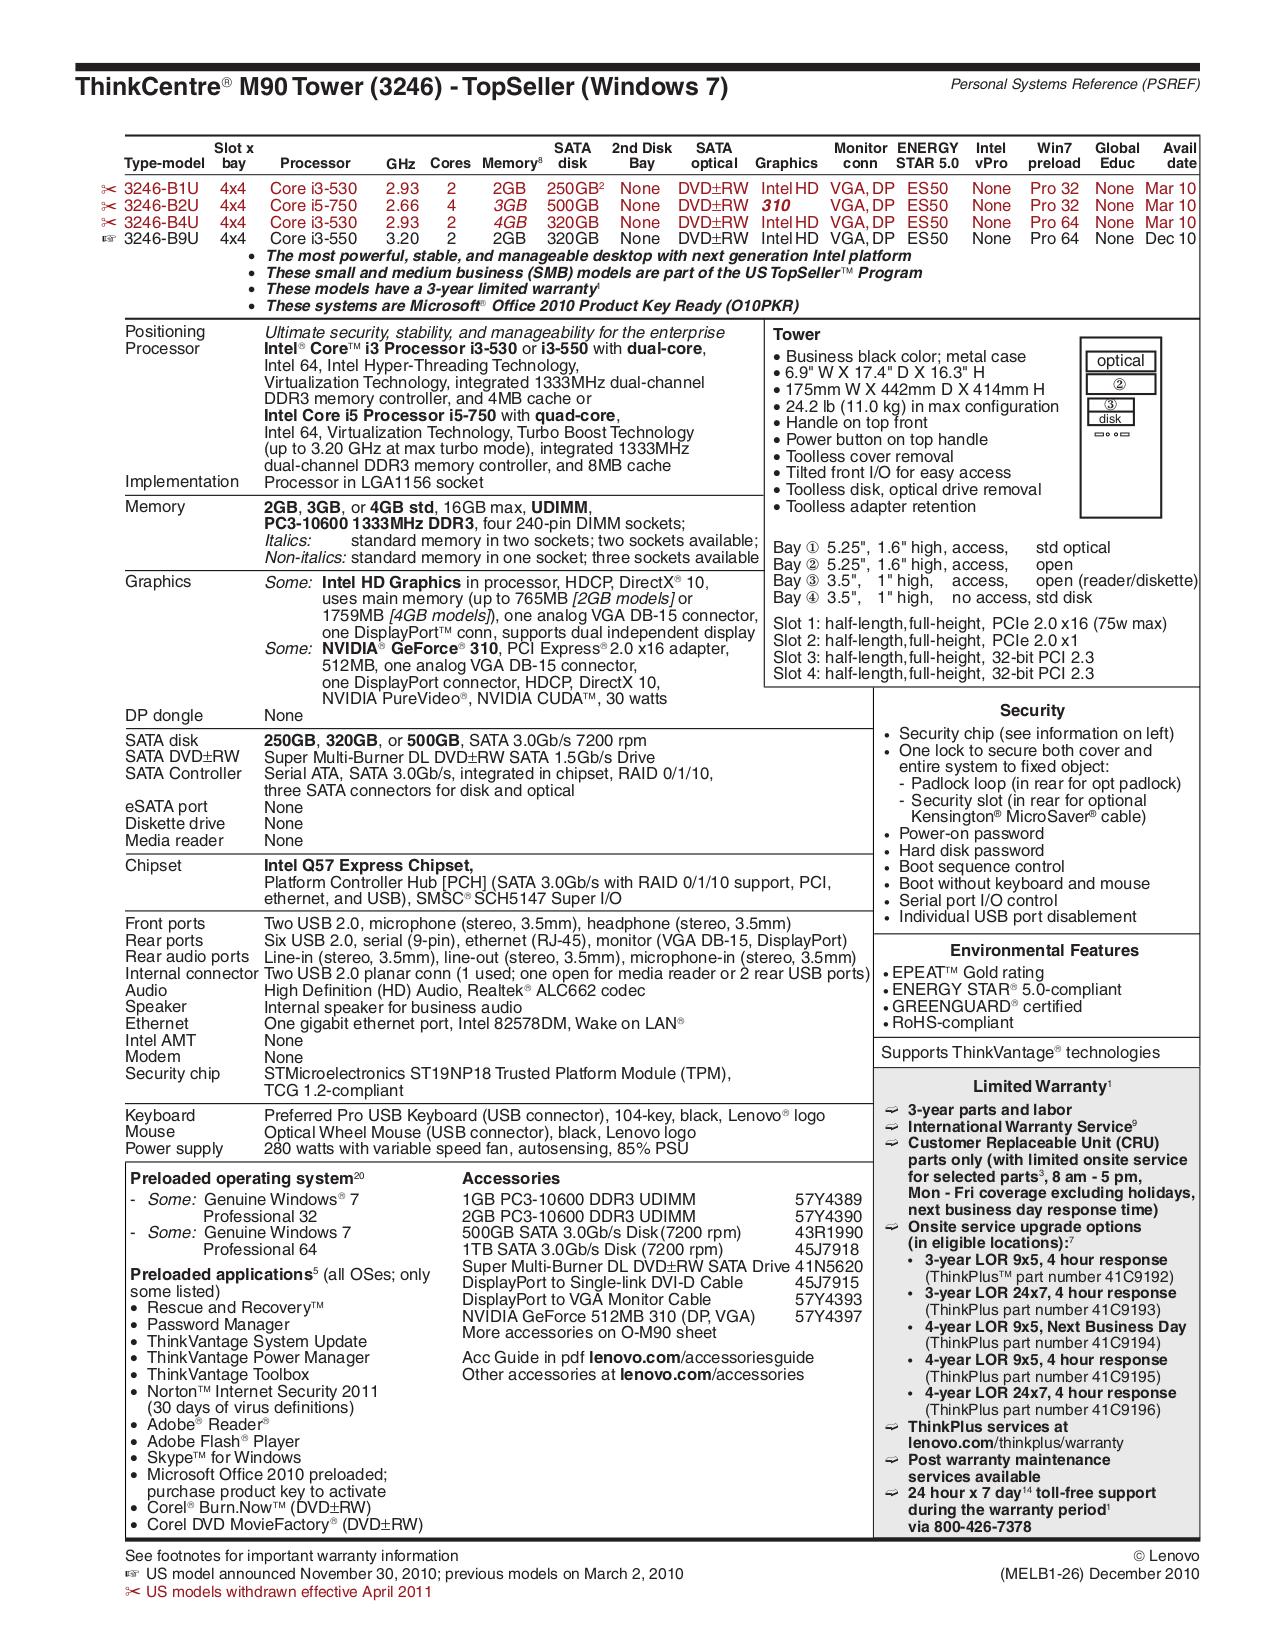 pdf for Lenovo Desktop ThinkCentre M90 3246 manual